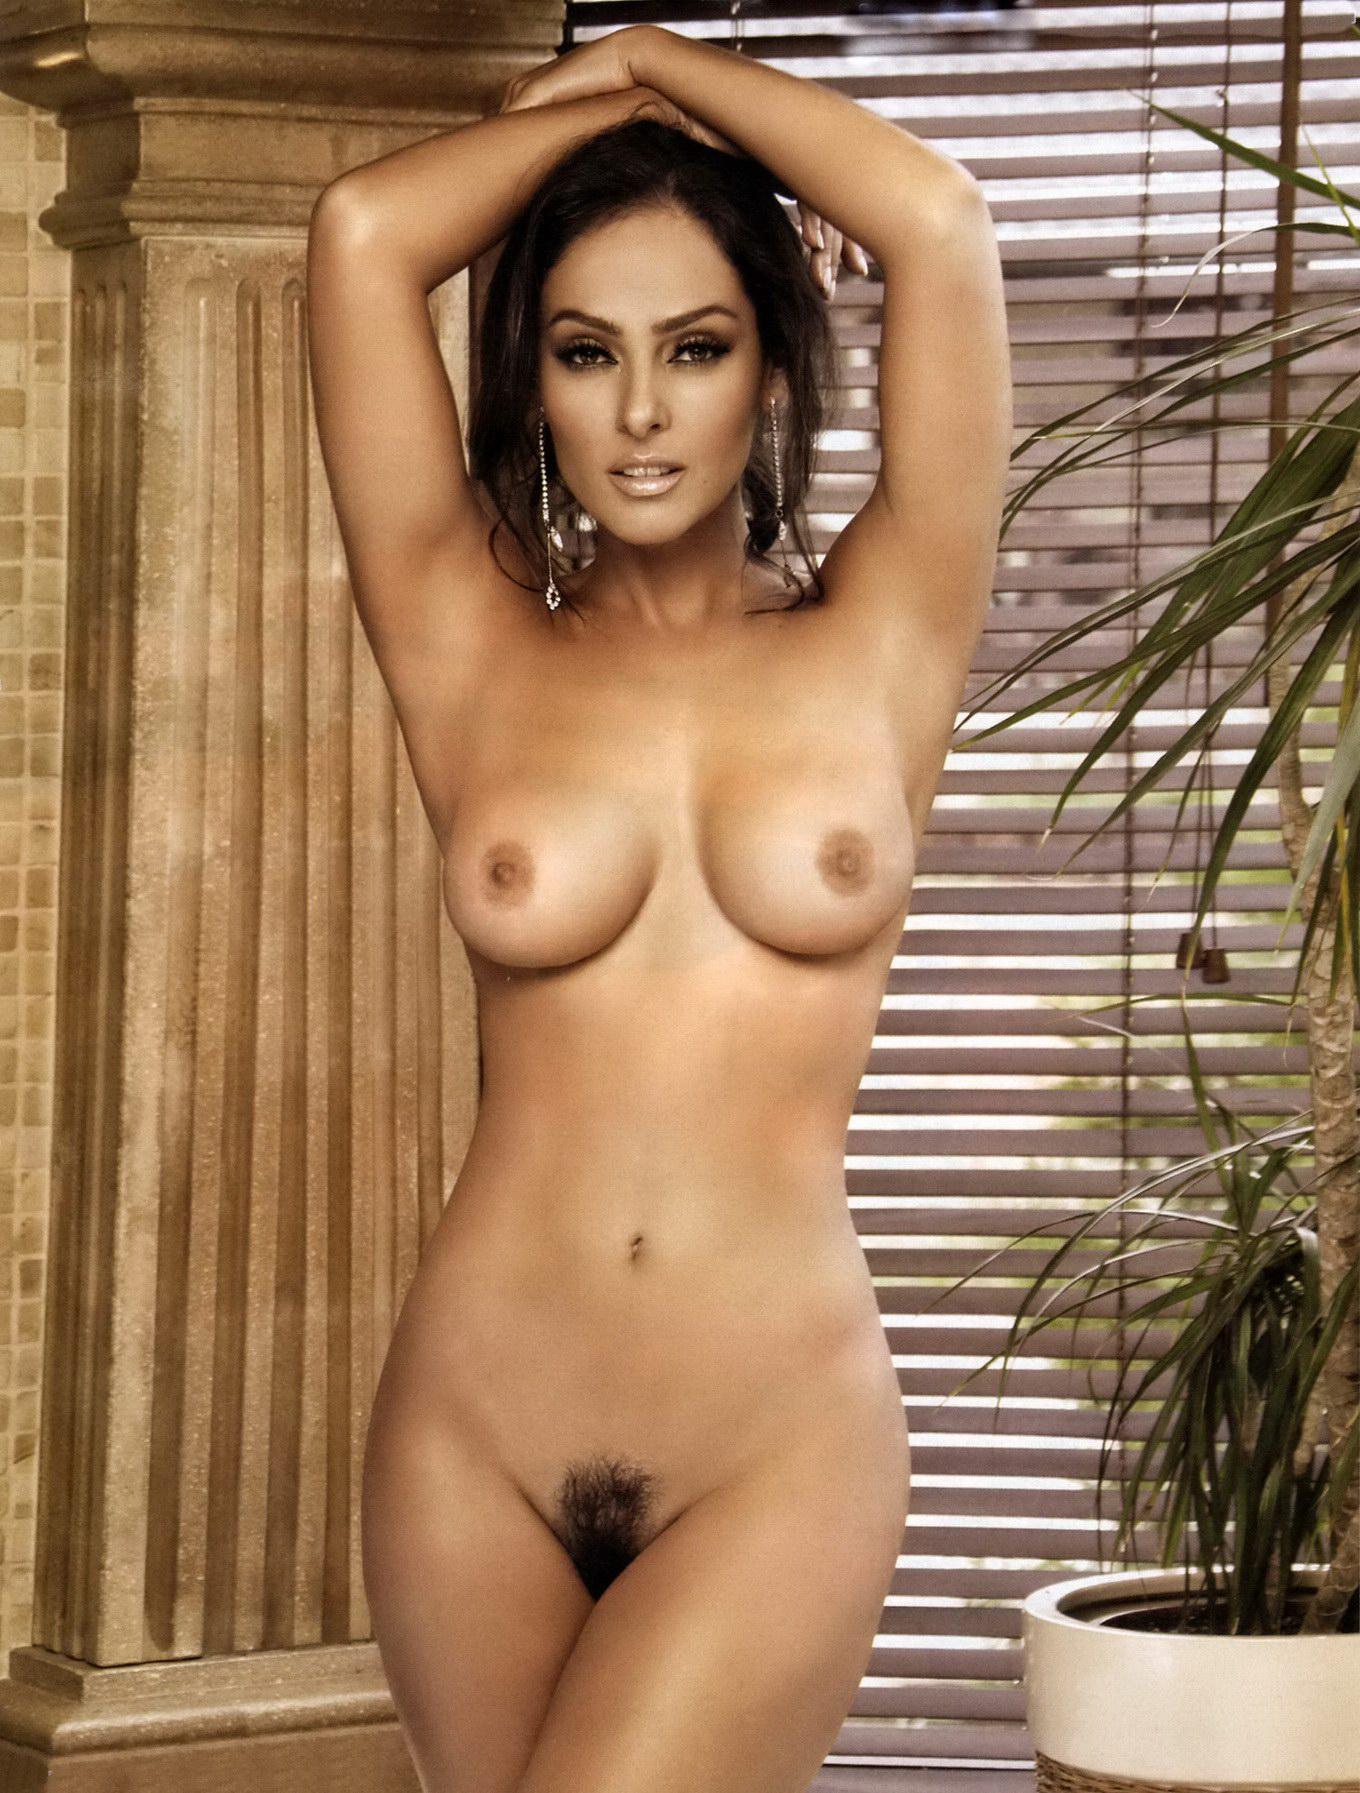 Mexicana babe nude 11